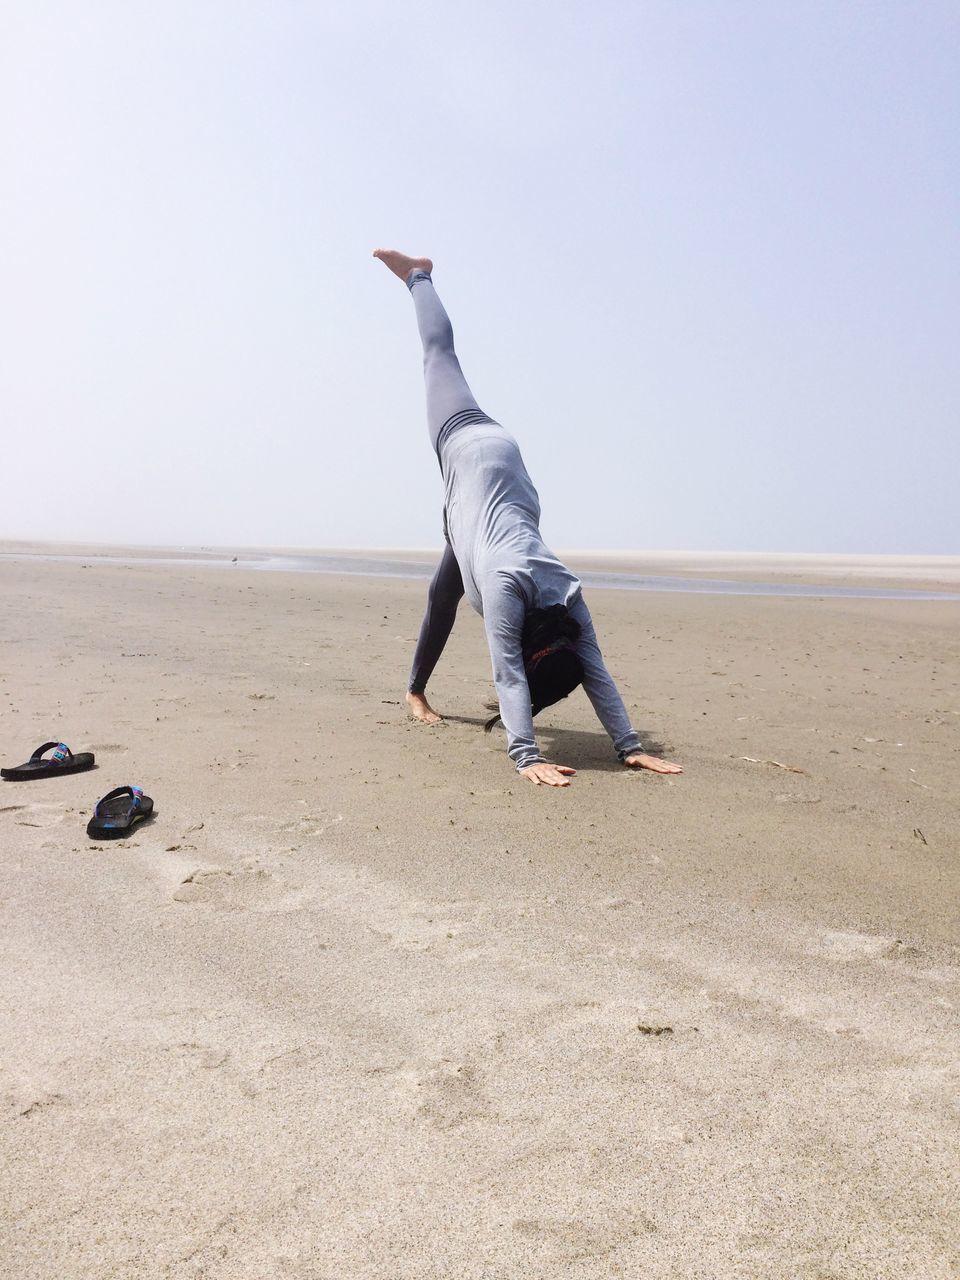 Woman Doing Handstand On Beach Against Clear Sky